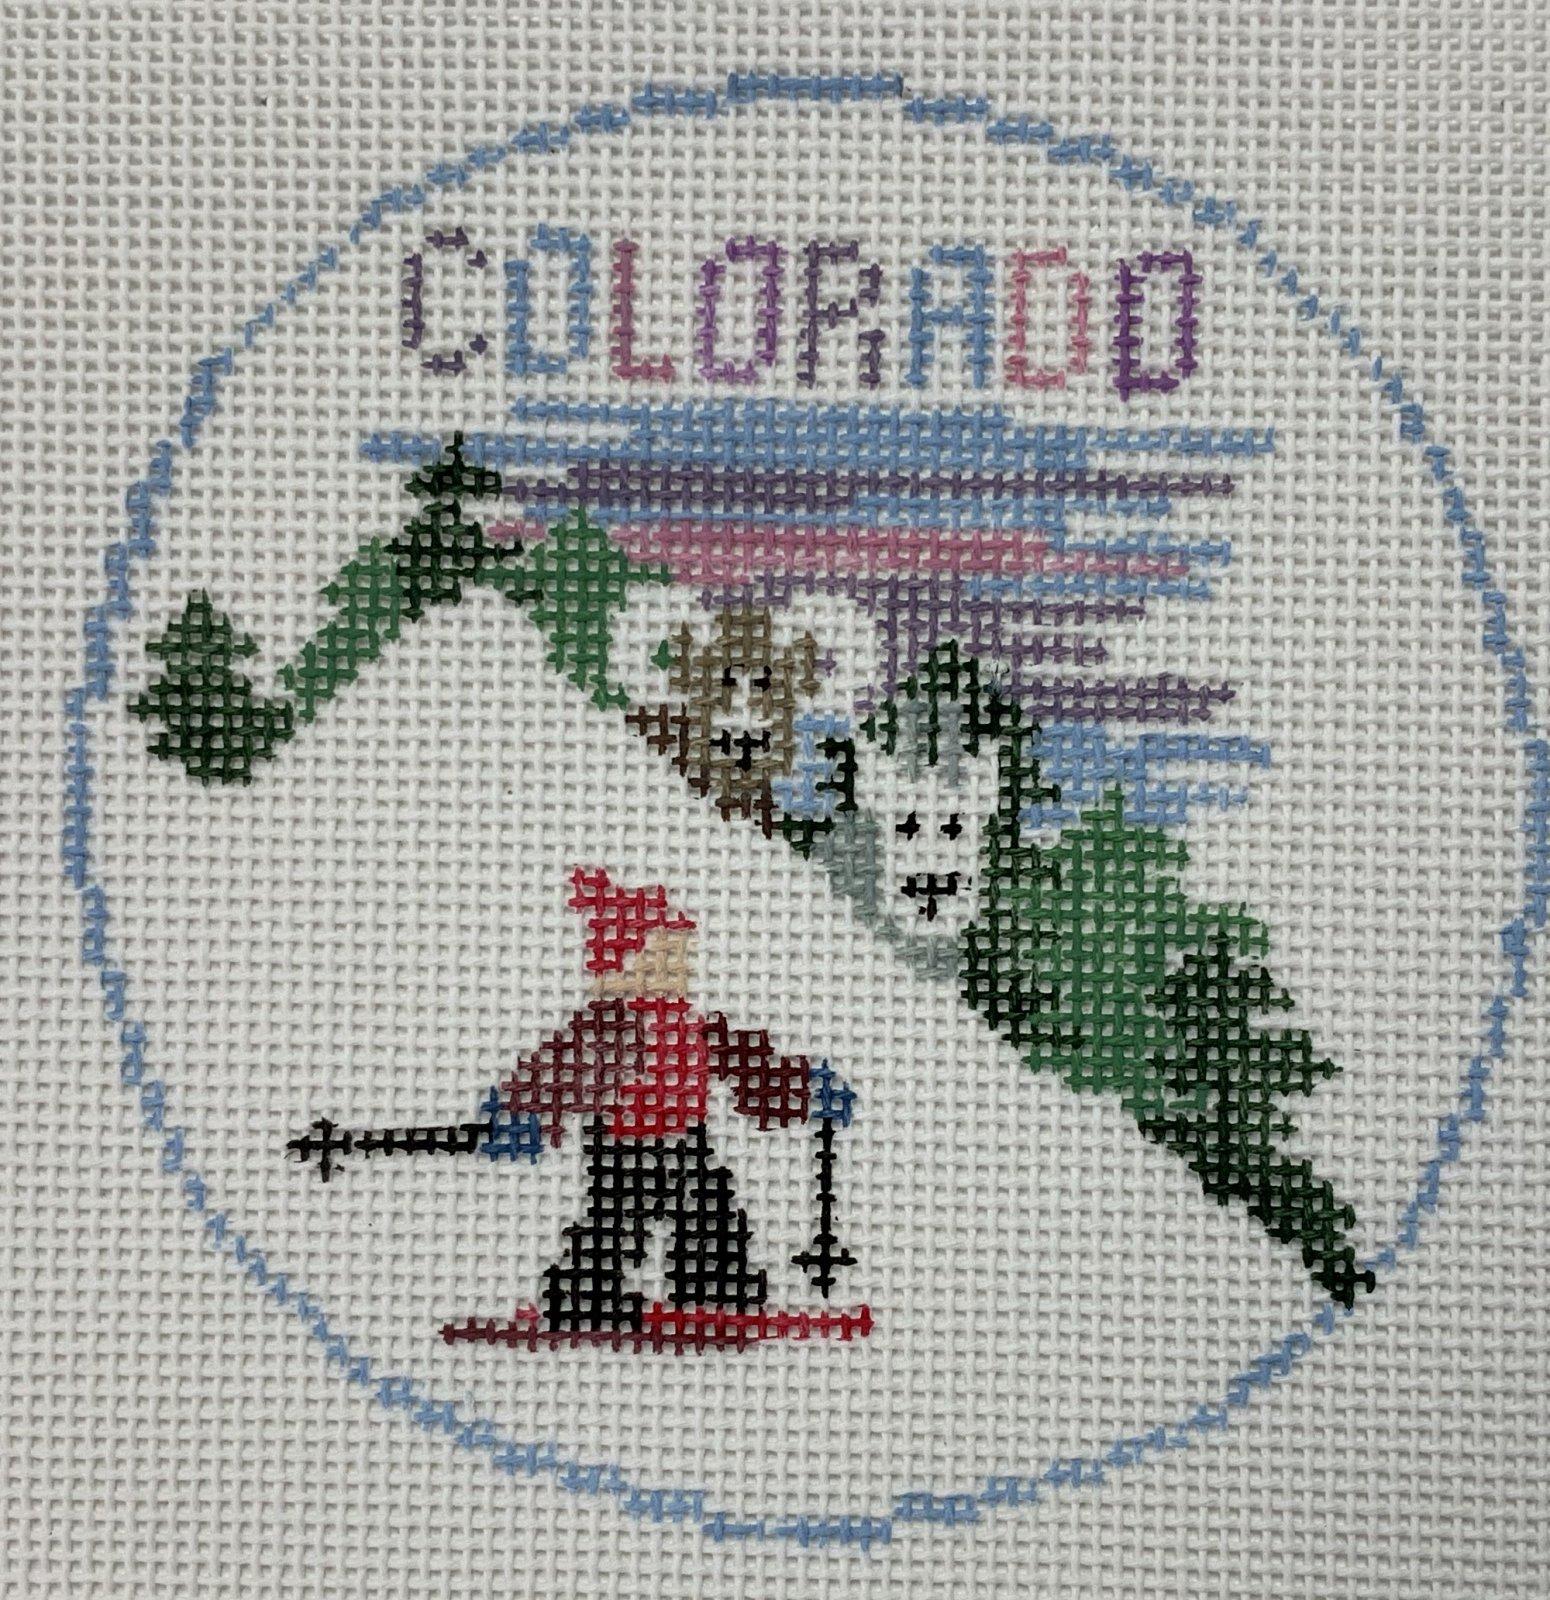 Colorado Round,18 ct.,4